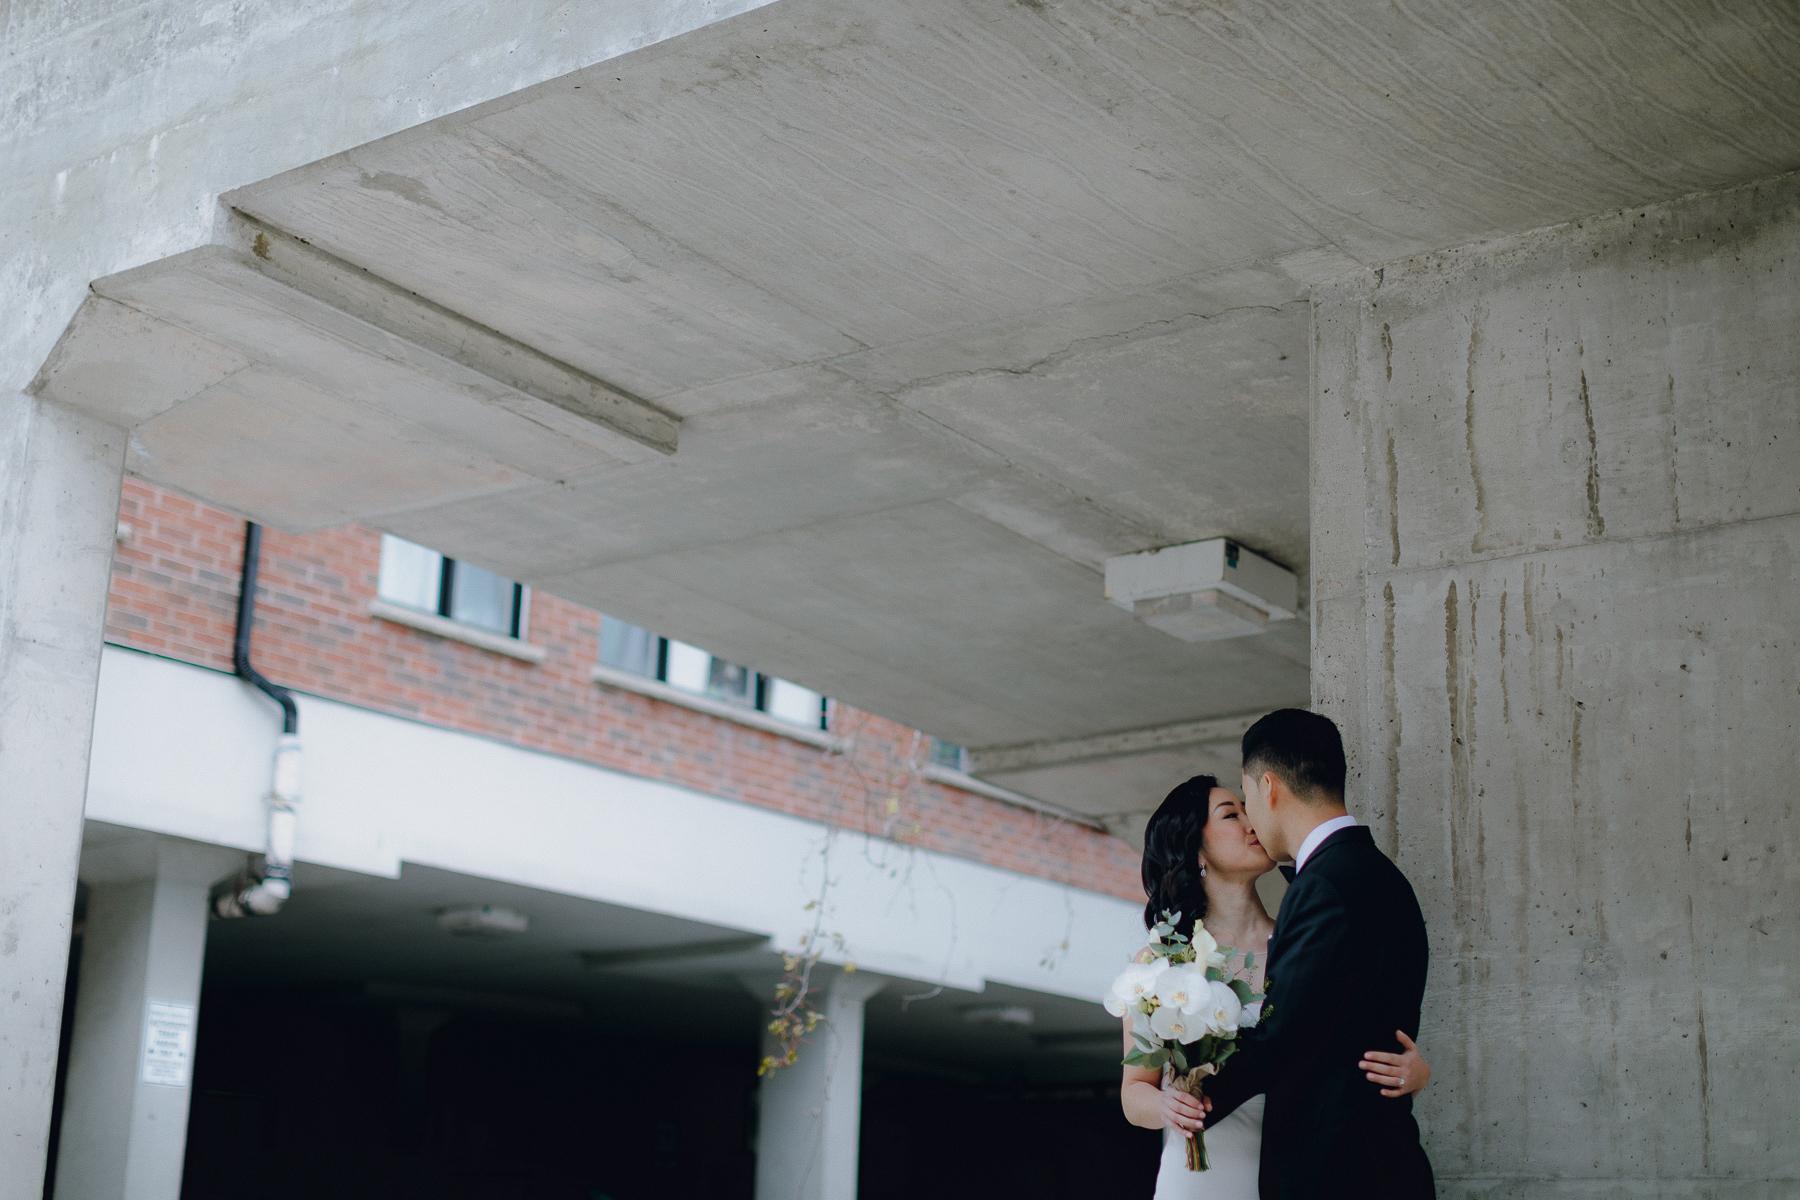 cannoe-restaurannt-wedding 0020.jpg